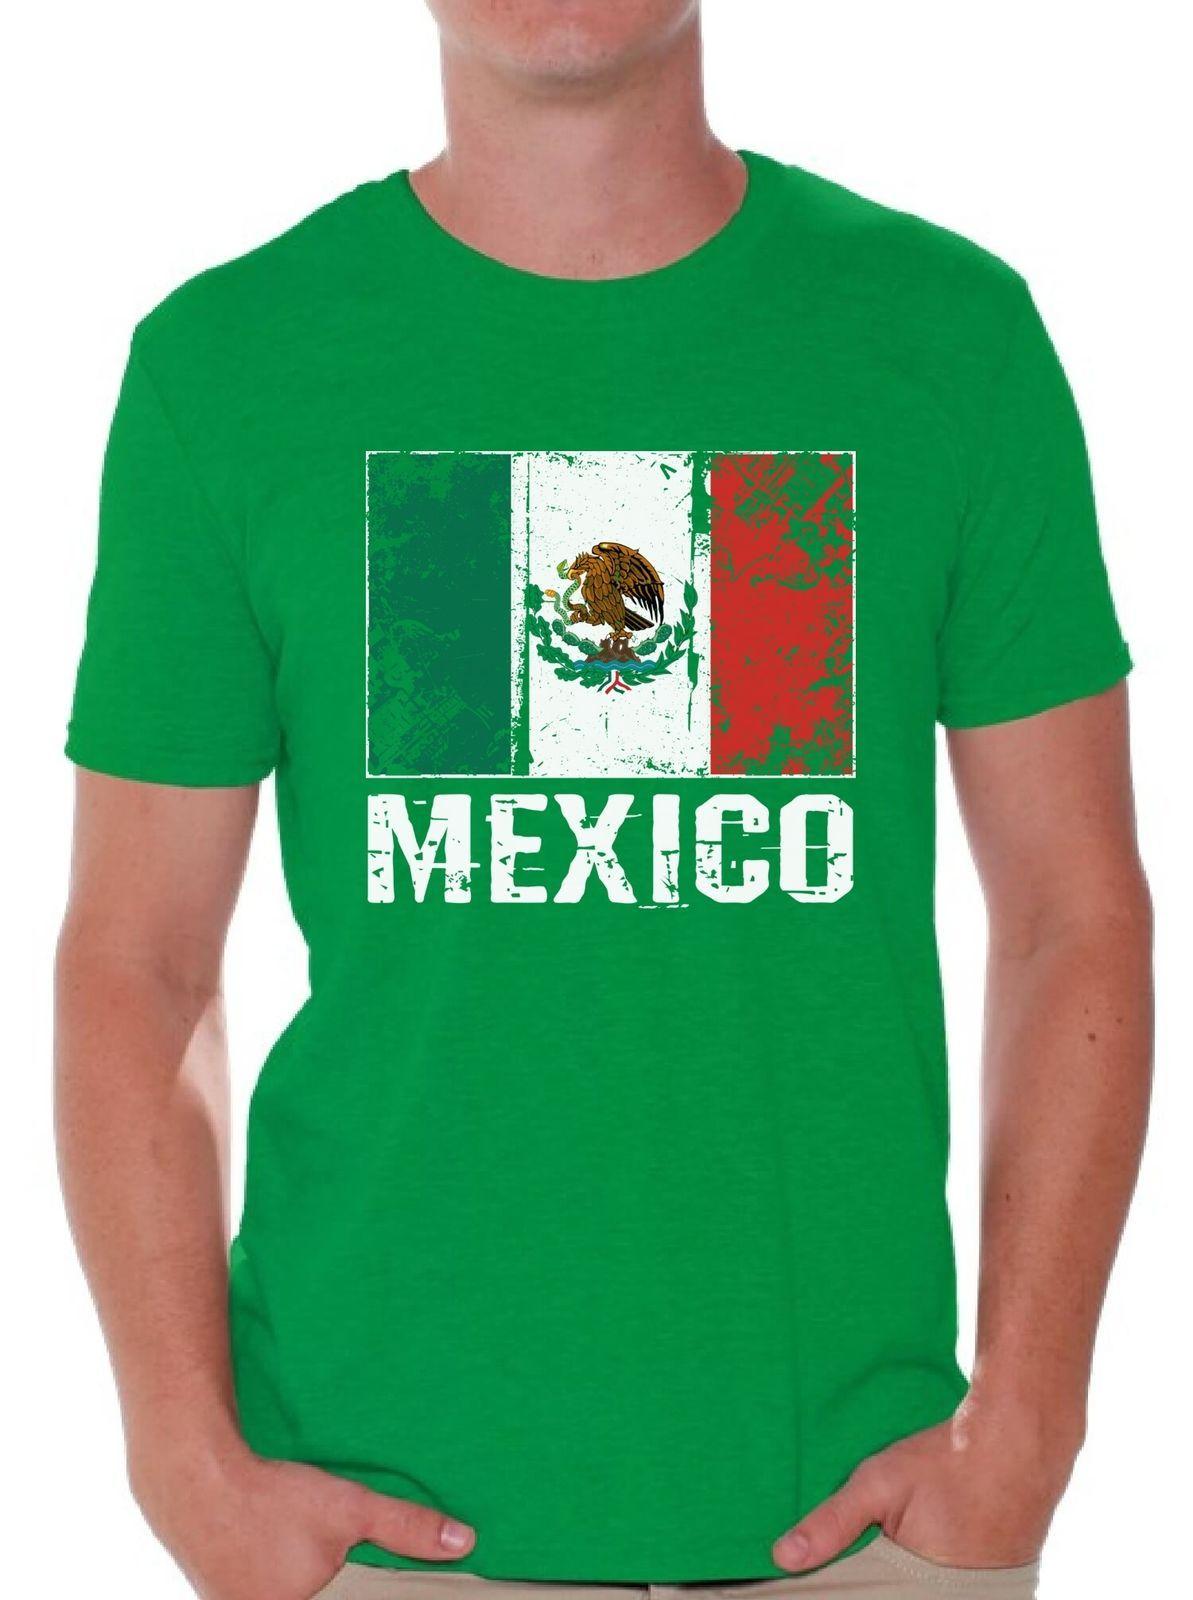 Mexico T Shirt Mexico Shirt 2018 Mexico Soccer Shirts For Men Cool